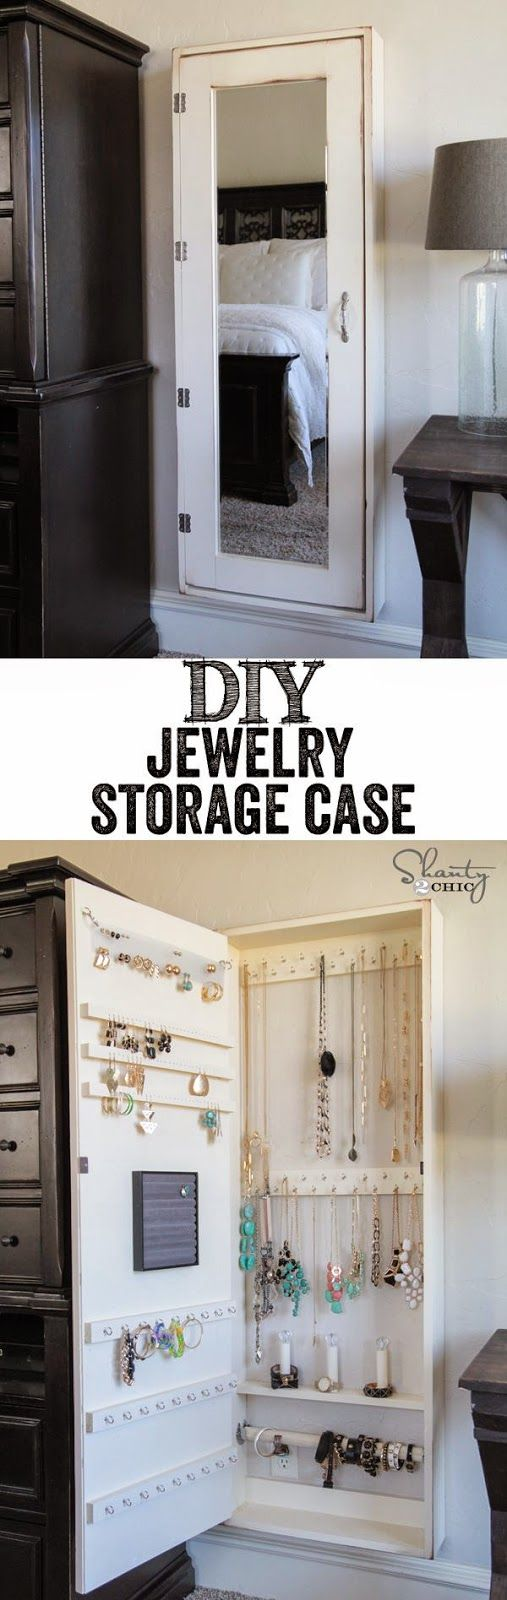 Foyer Diy Jewelry : Best jewelry storage images on pinterest